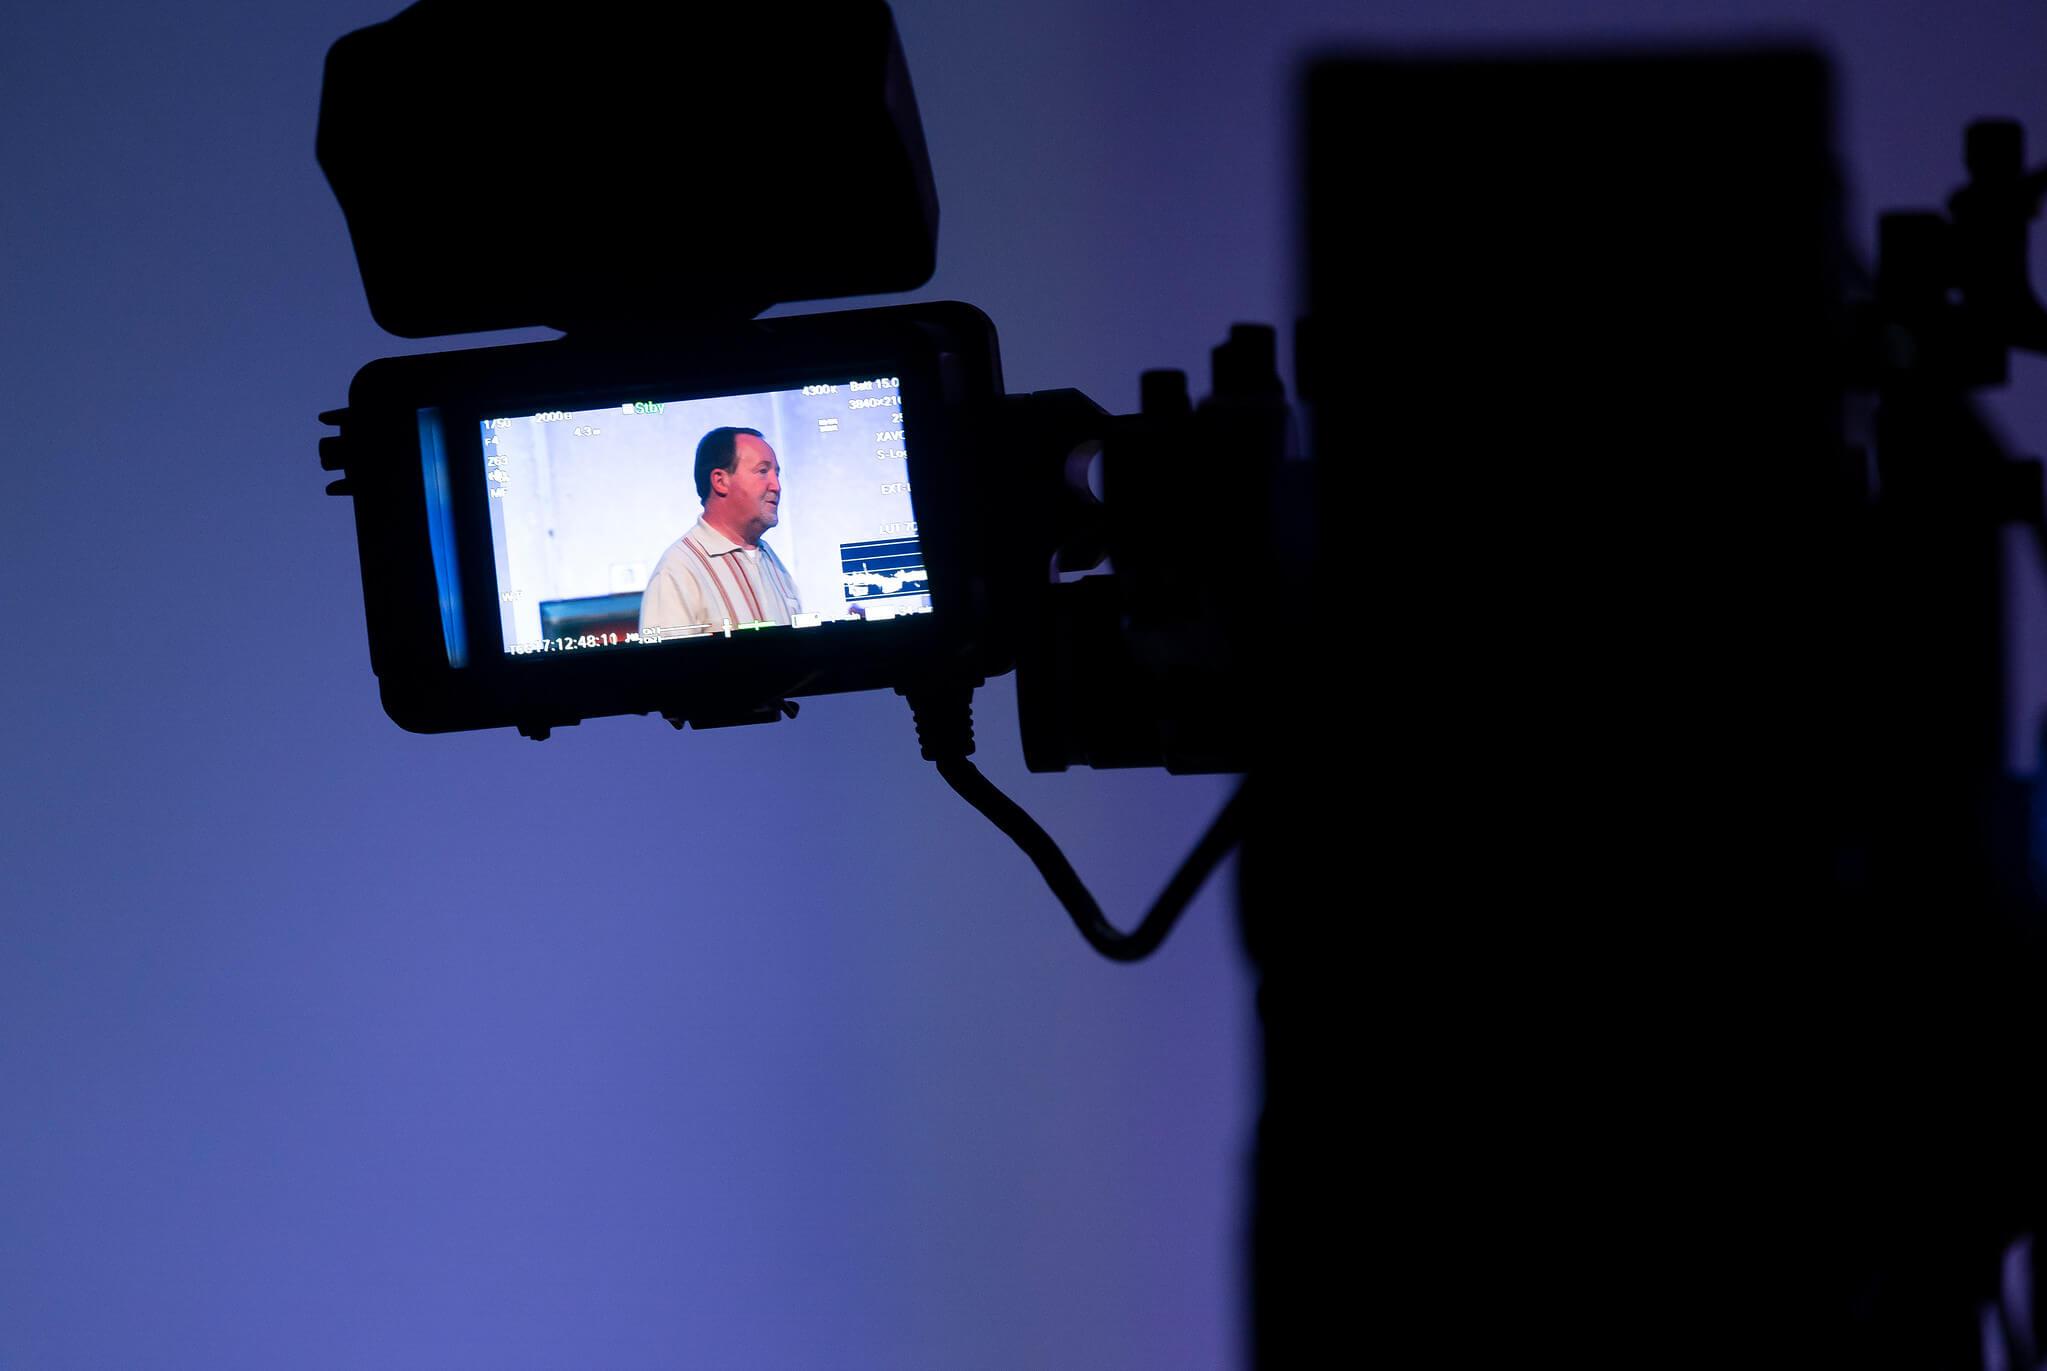 Rehearsal image for Fibres films showing a camera monitor displaying Jonathan Watson